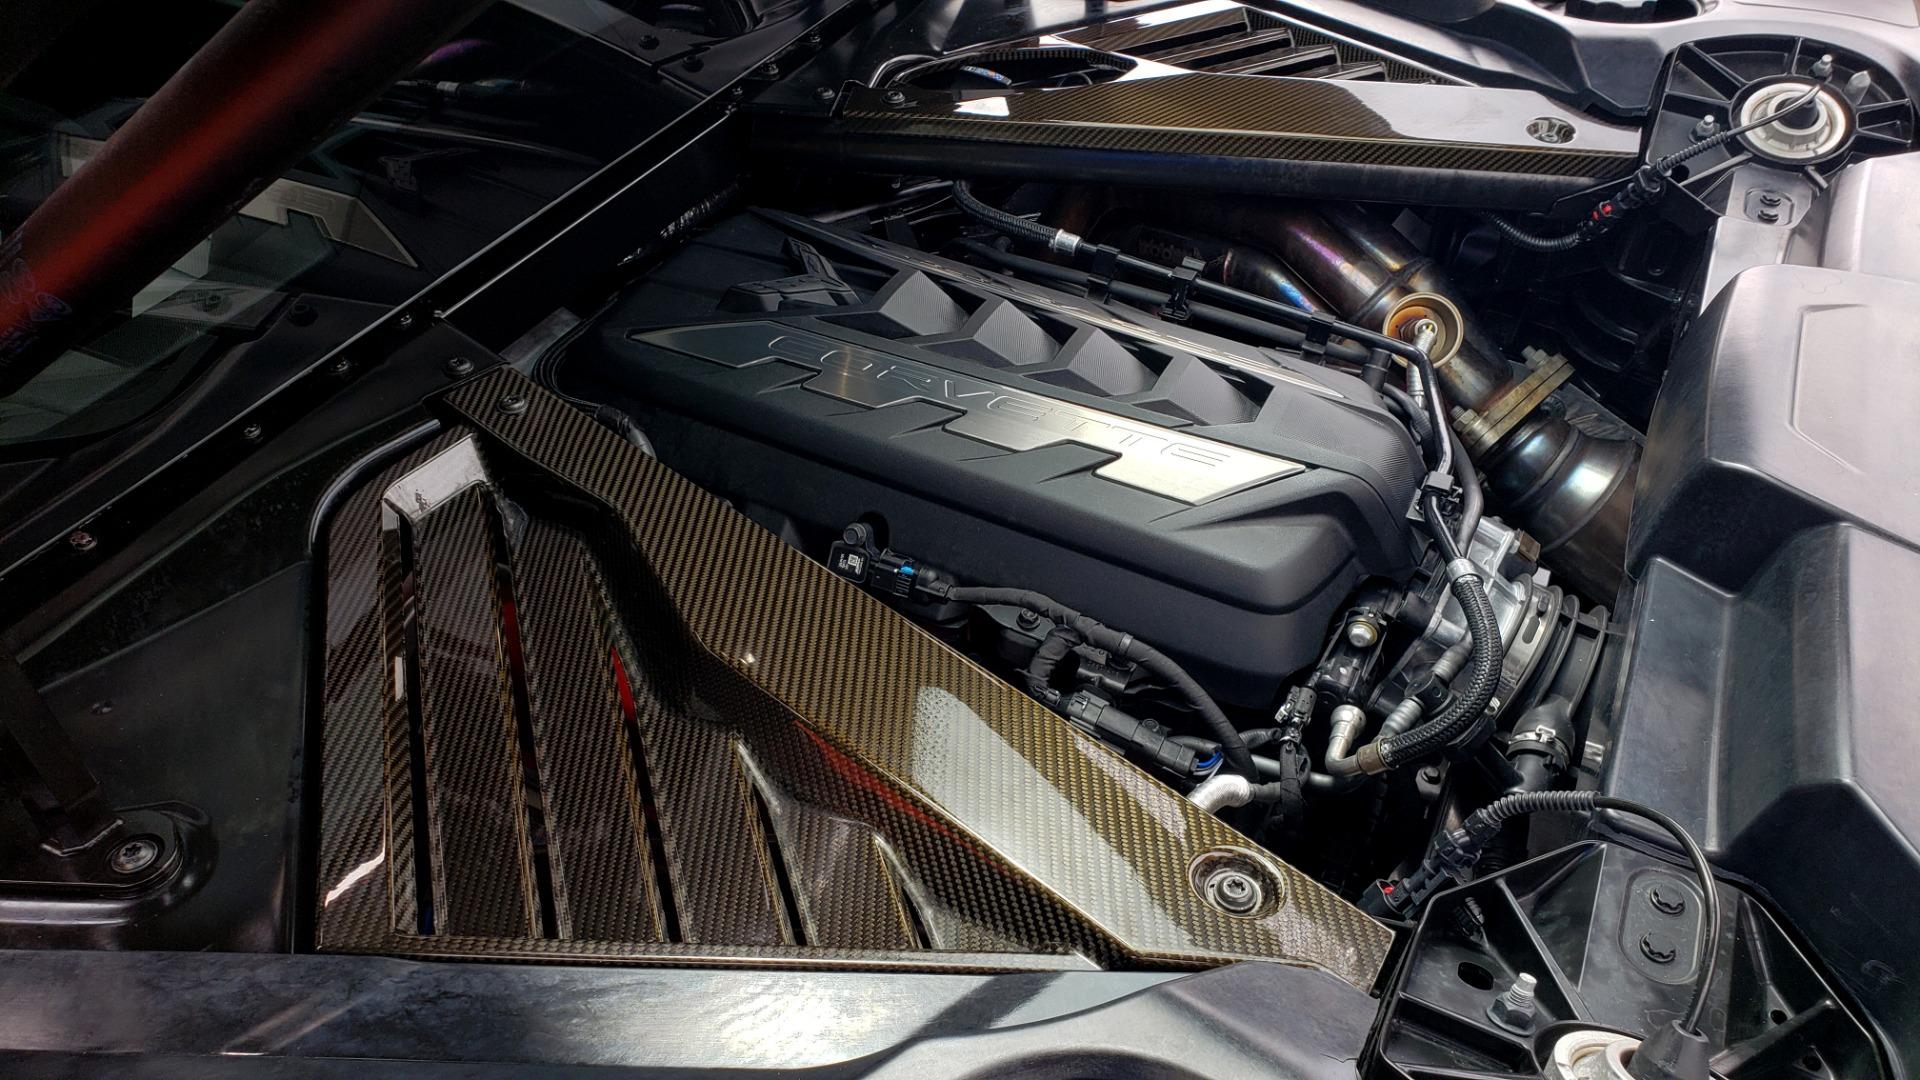 Used 2020 Chevrolet CORVETTE C8 STINGRAY 2LT / 6.2L V8 / 8-SPD AUTO / NAV / BOSE / REARVIEW / DATA RECOR for sale Sold at Formula Imports in Charlotte NC 28227 24